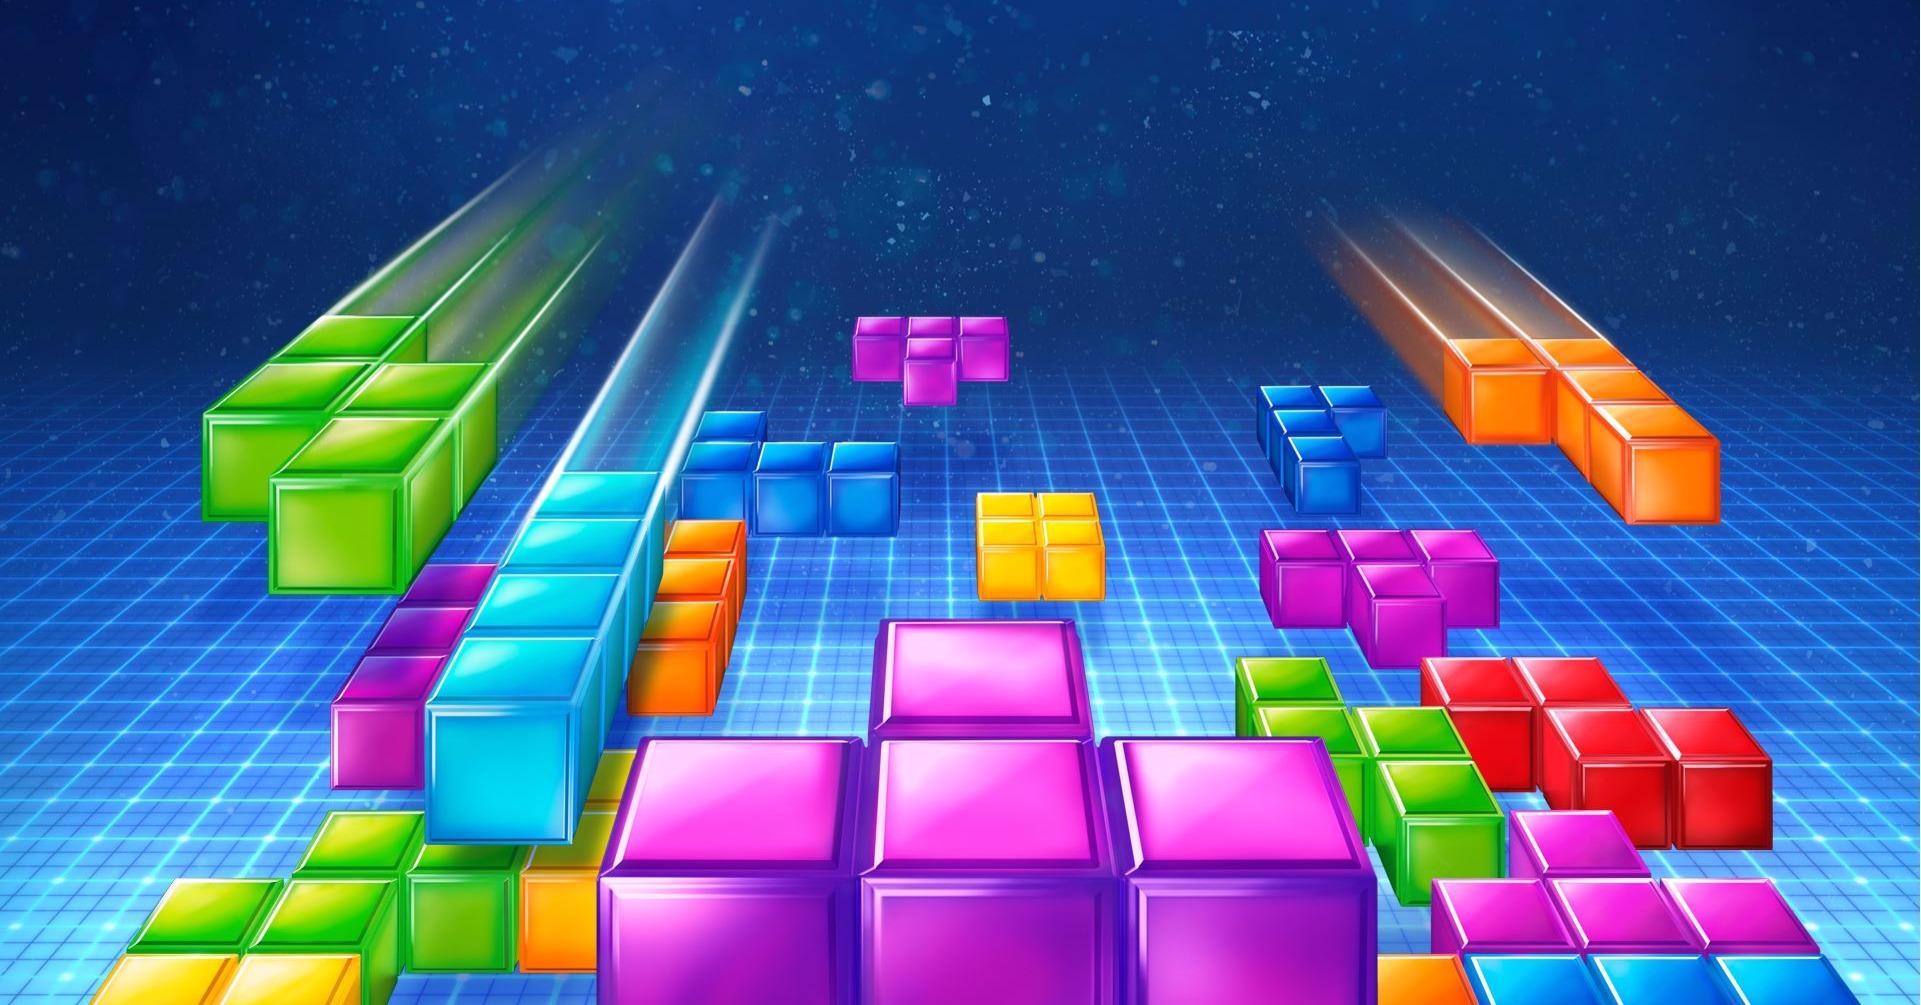 tetris-film.jpg